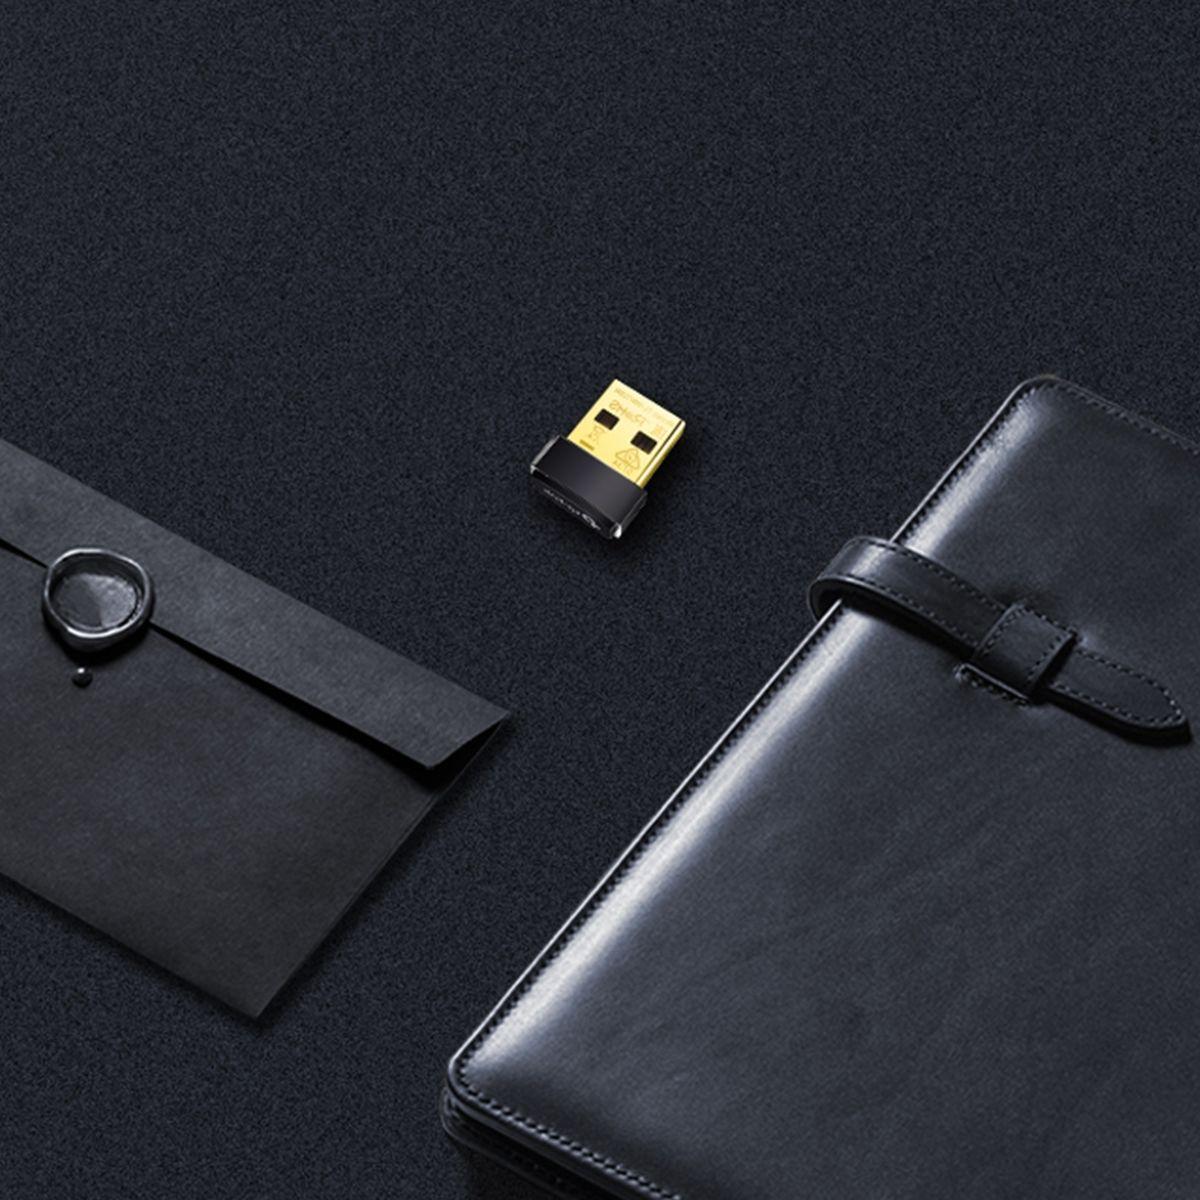 Nano USB Adapteur